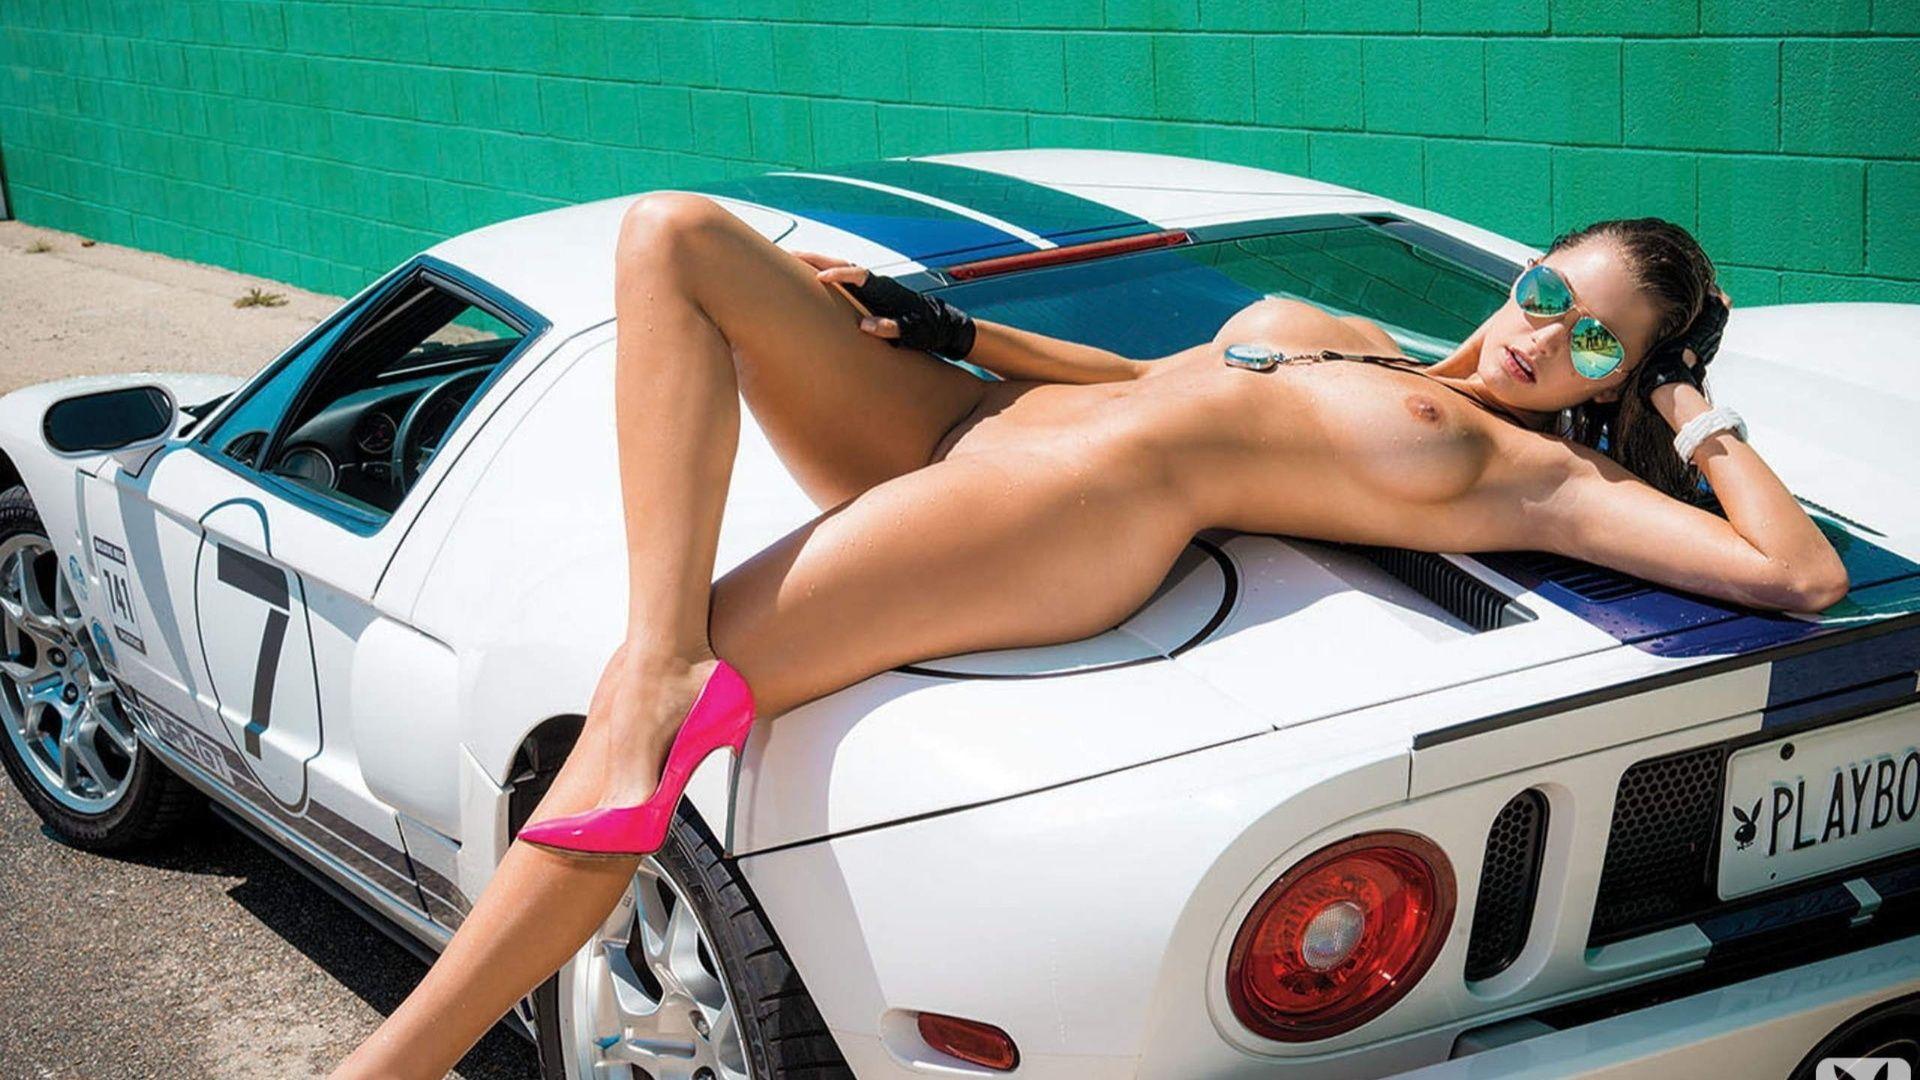 Girls Driving Car Naked Porn Videos Pornhubcom